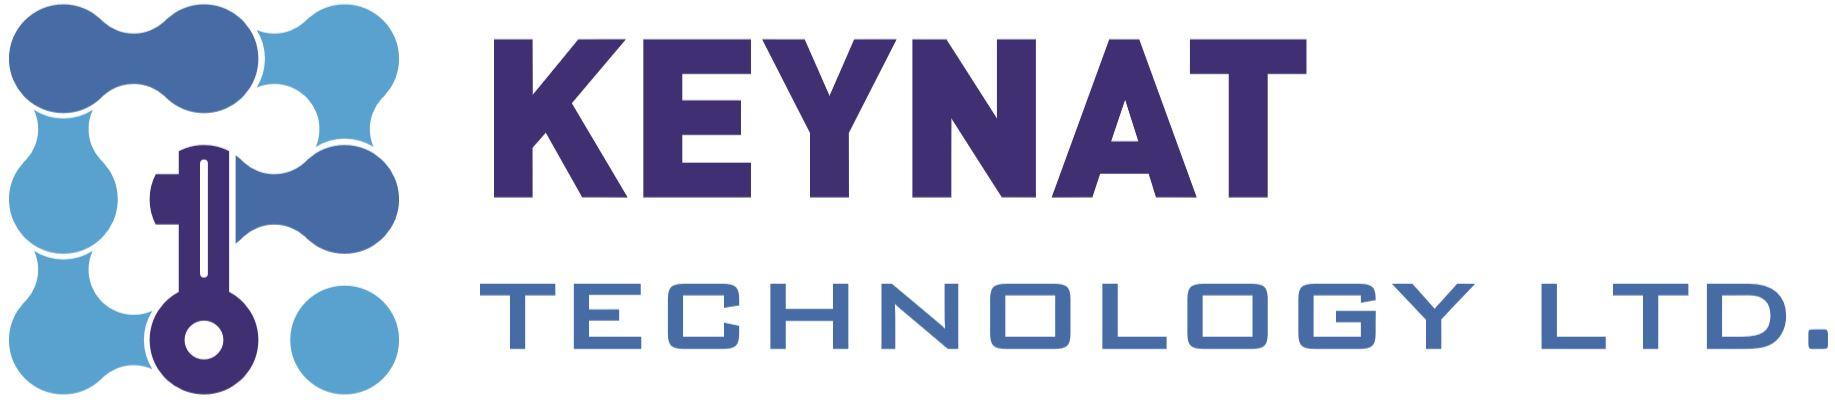 Keynat Technology Ltd. logo